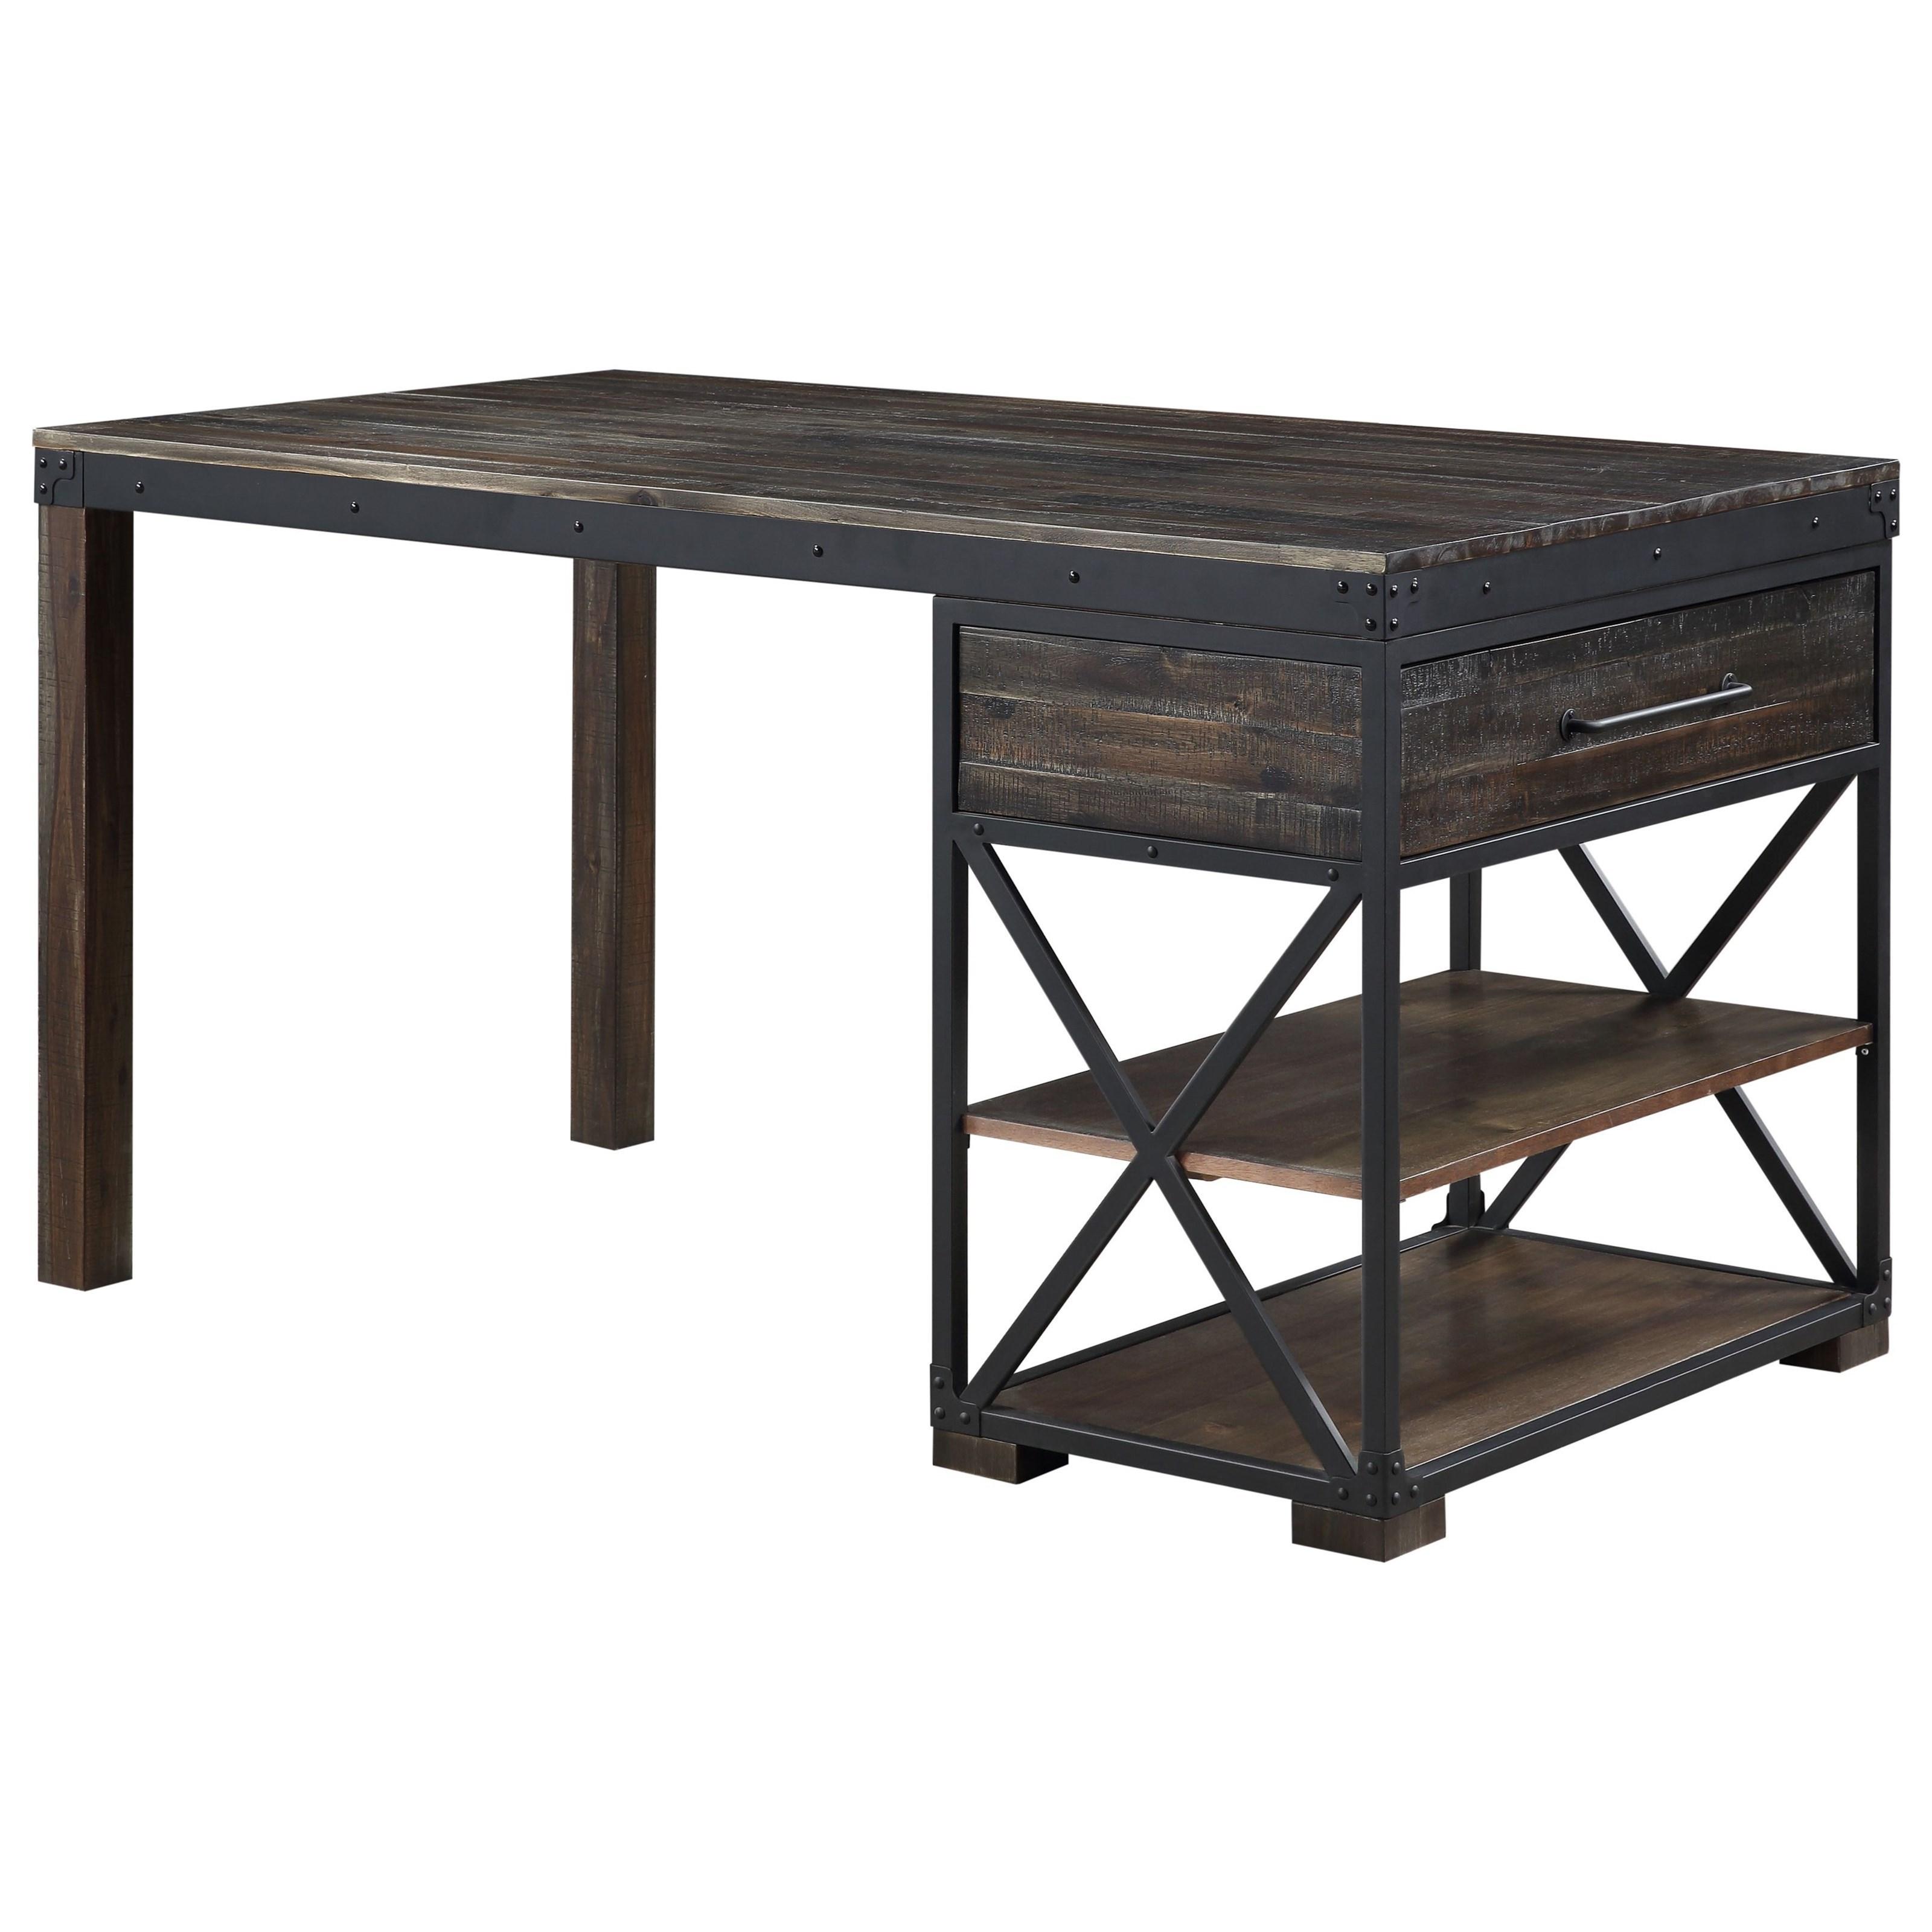 Canyon Ridge Counter Dining Table by Coast to Coast Imports at Johnny Janosik